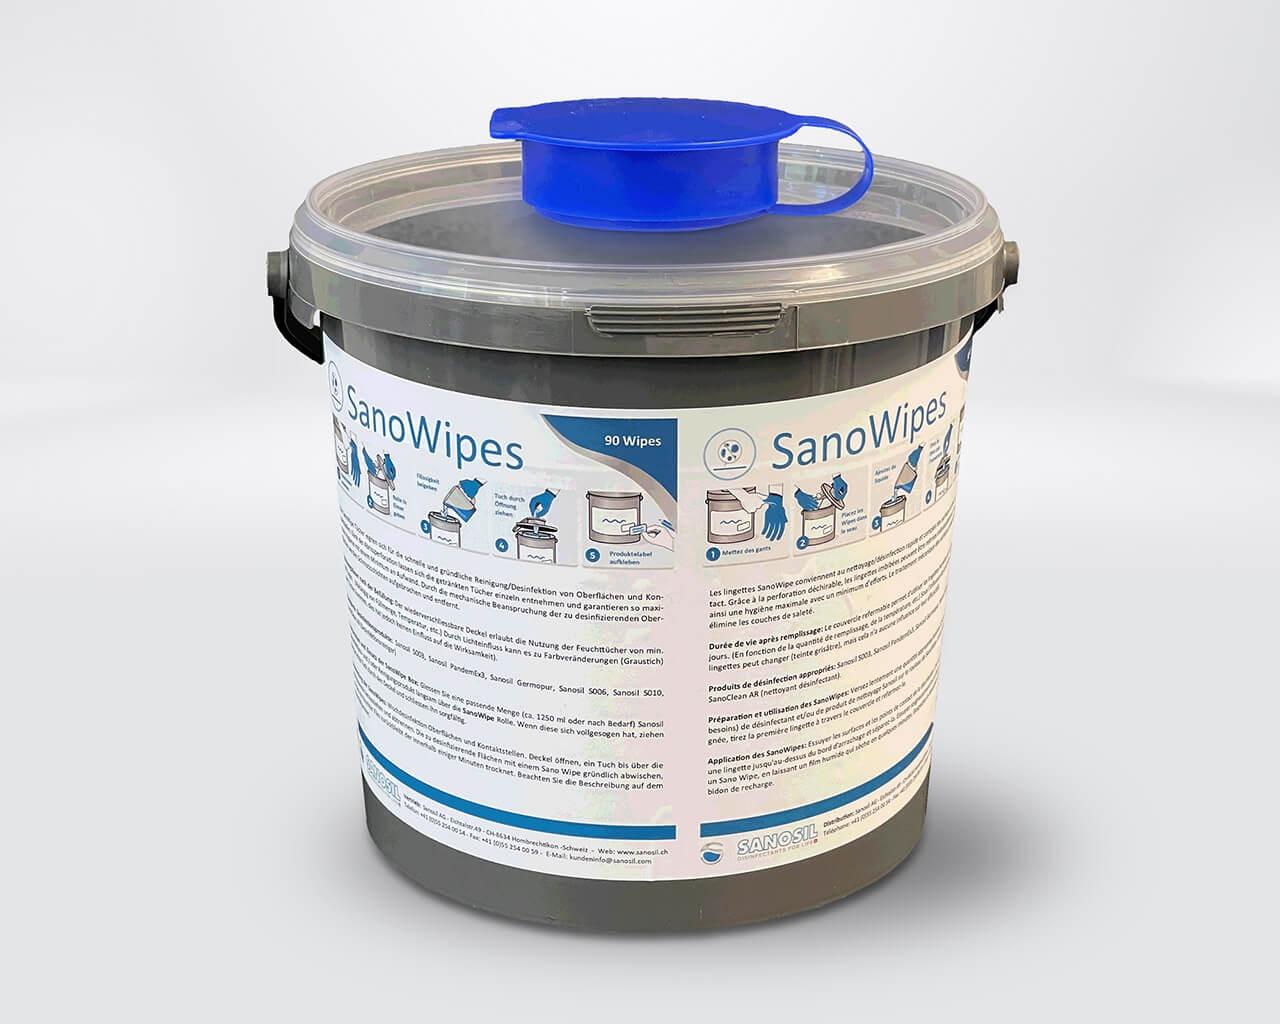 Sano-Wipes Big Box Spender